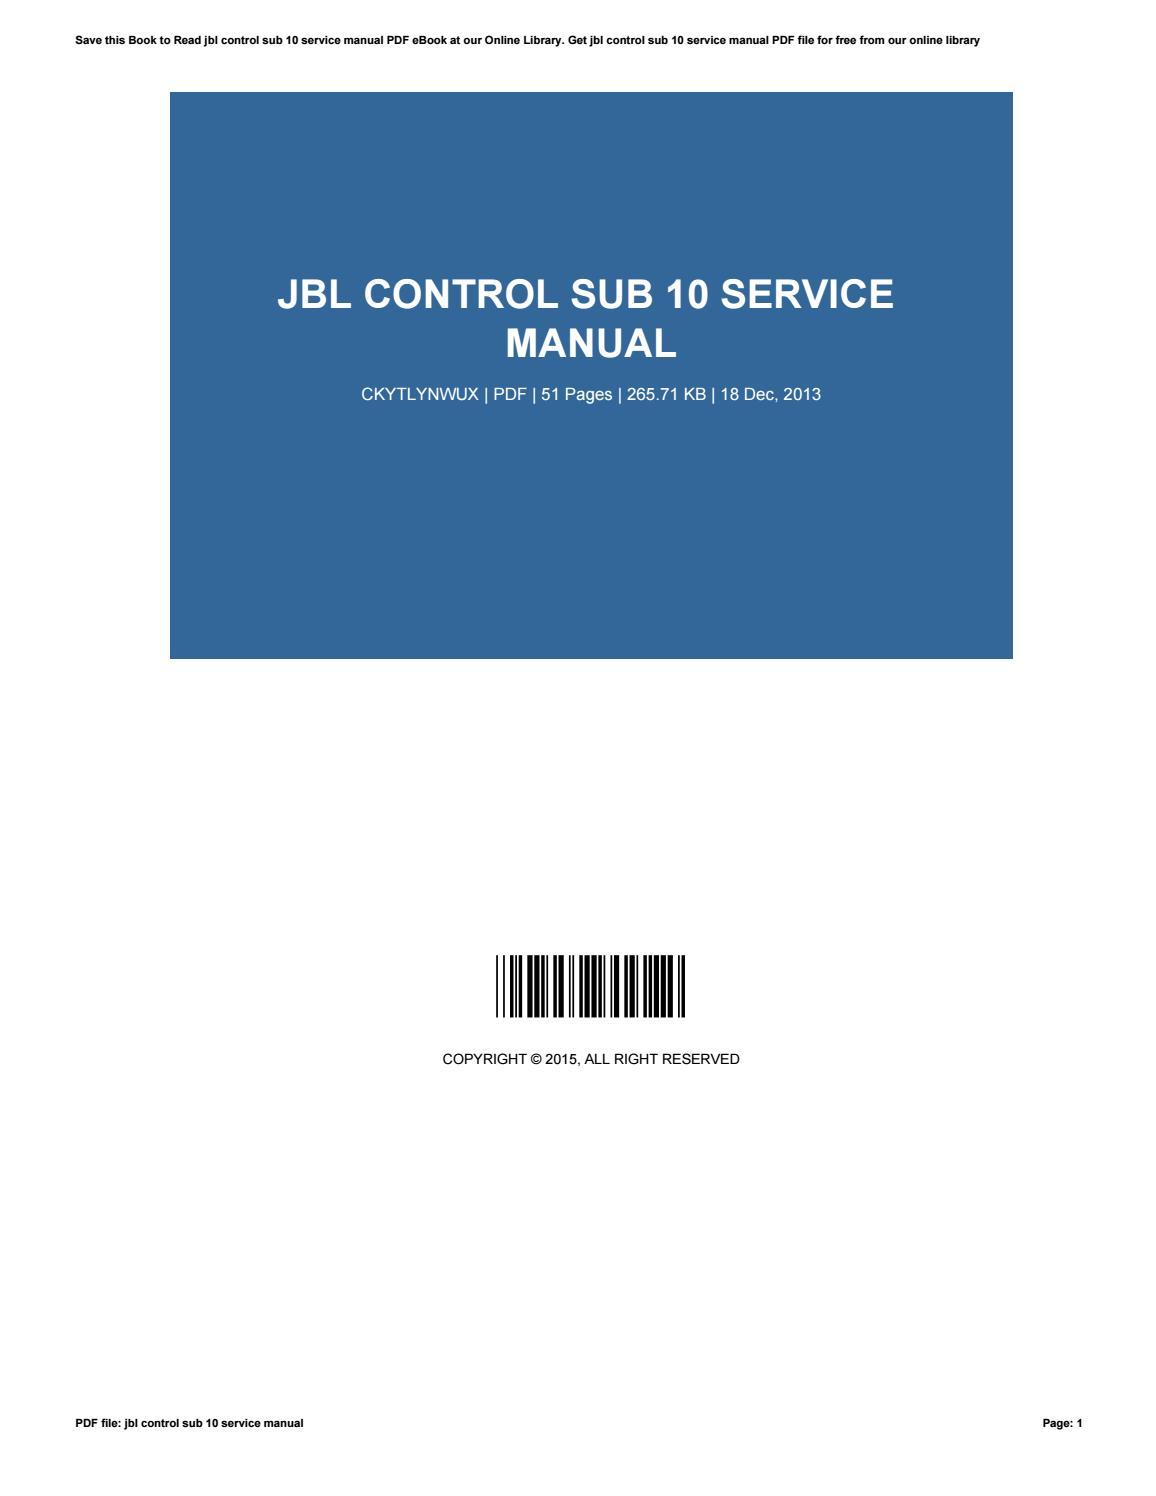 jbl control sub 10 service manual by edwardphillips3983 issuu rh issuu com JBL Audio Subwoofer JBL Subwoofer Boxes